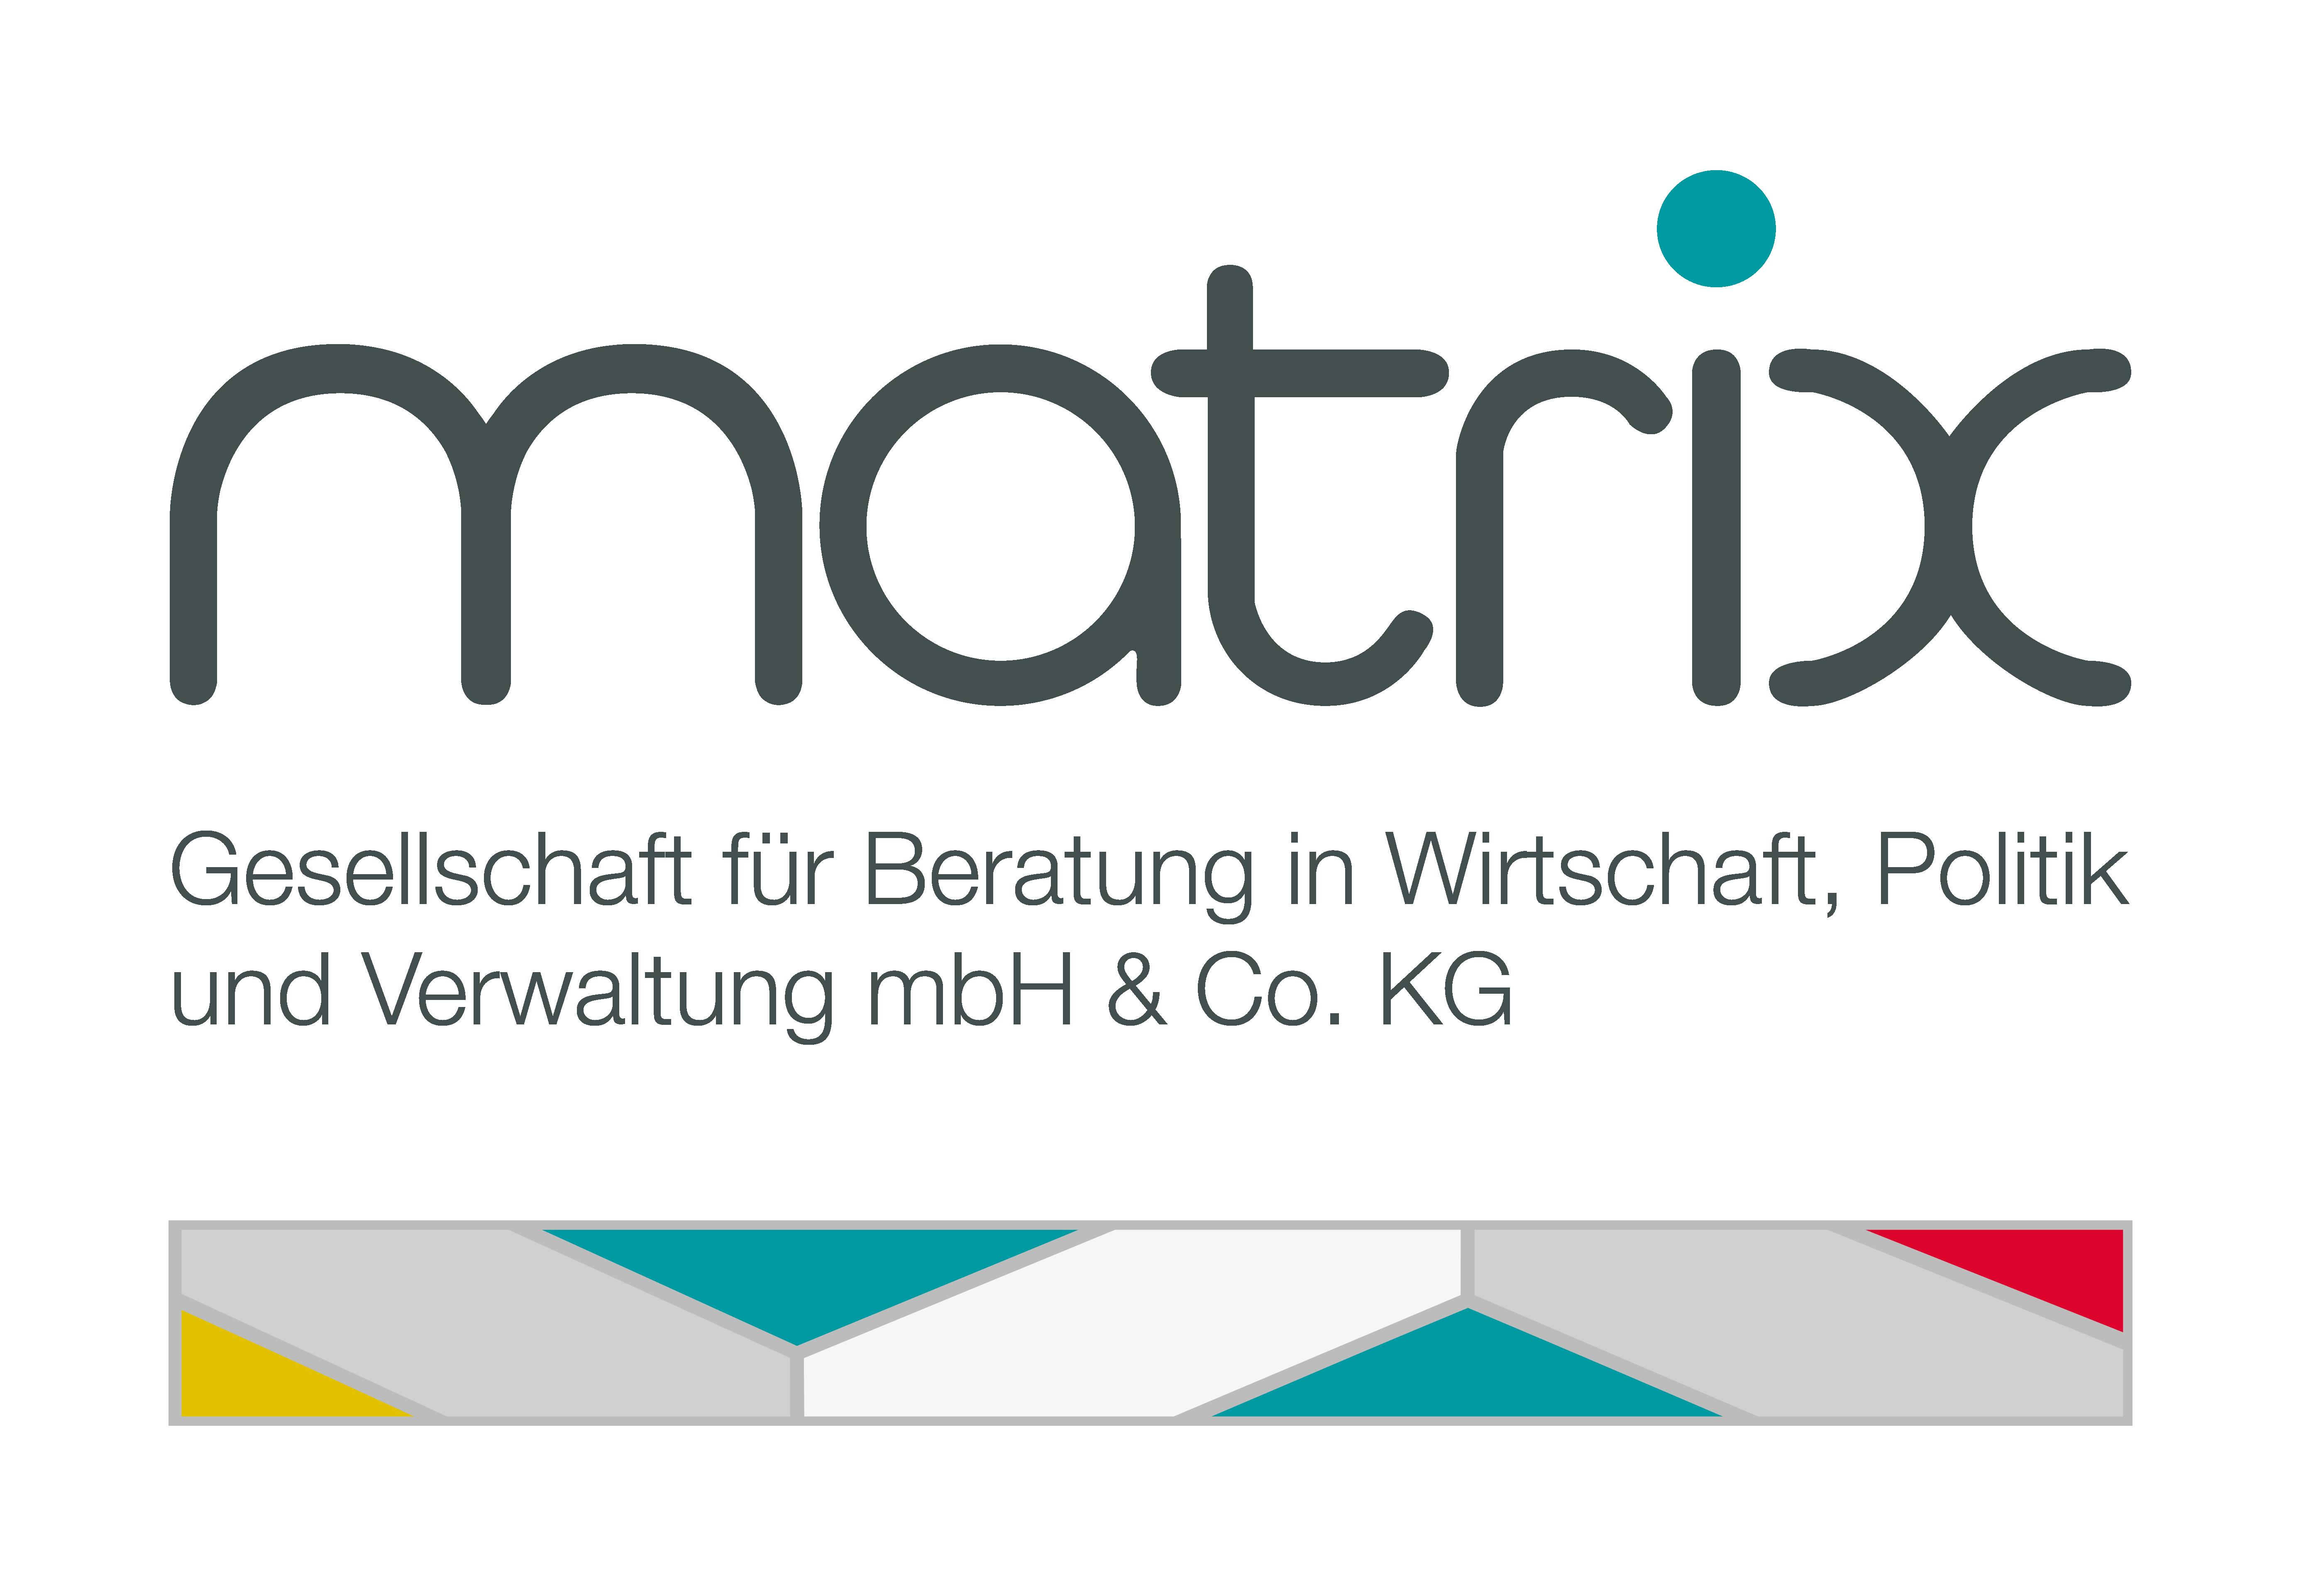 matrix GmbH & Co. KG